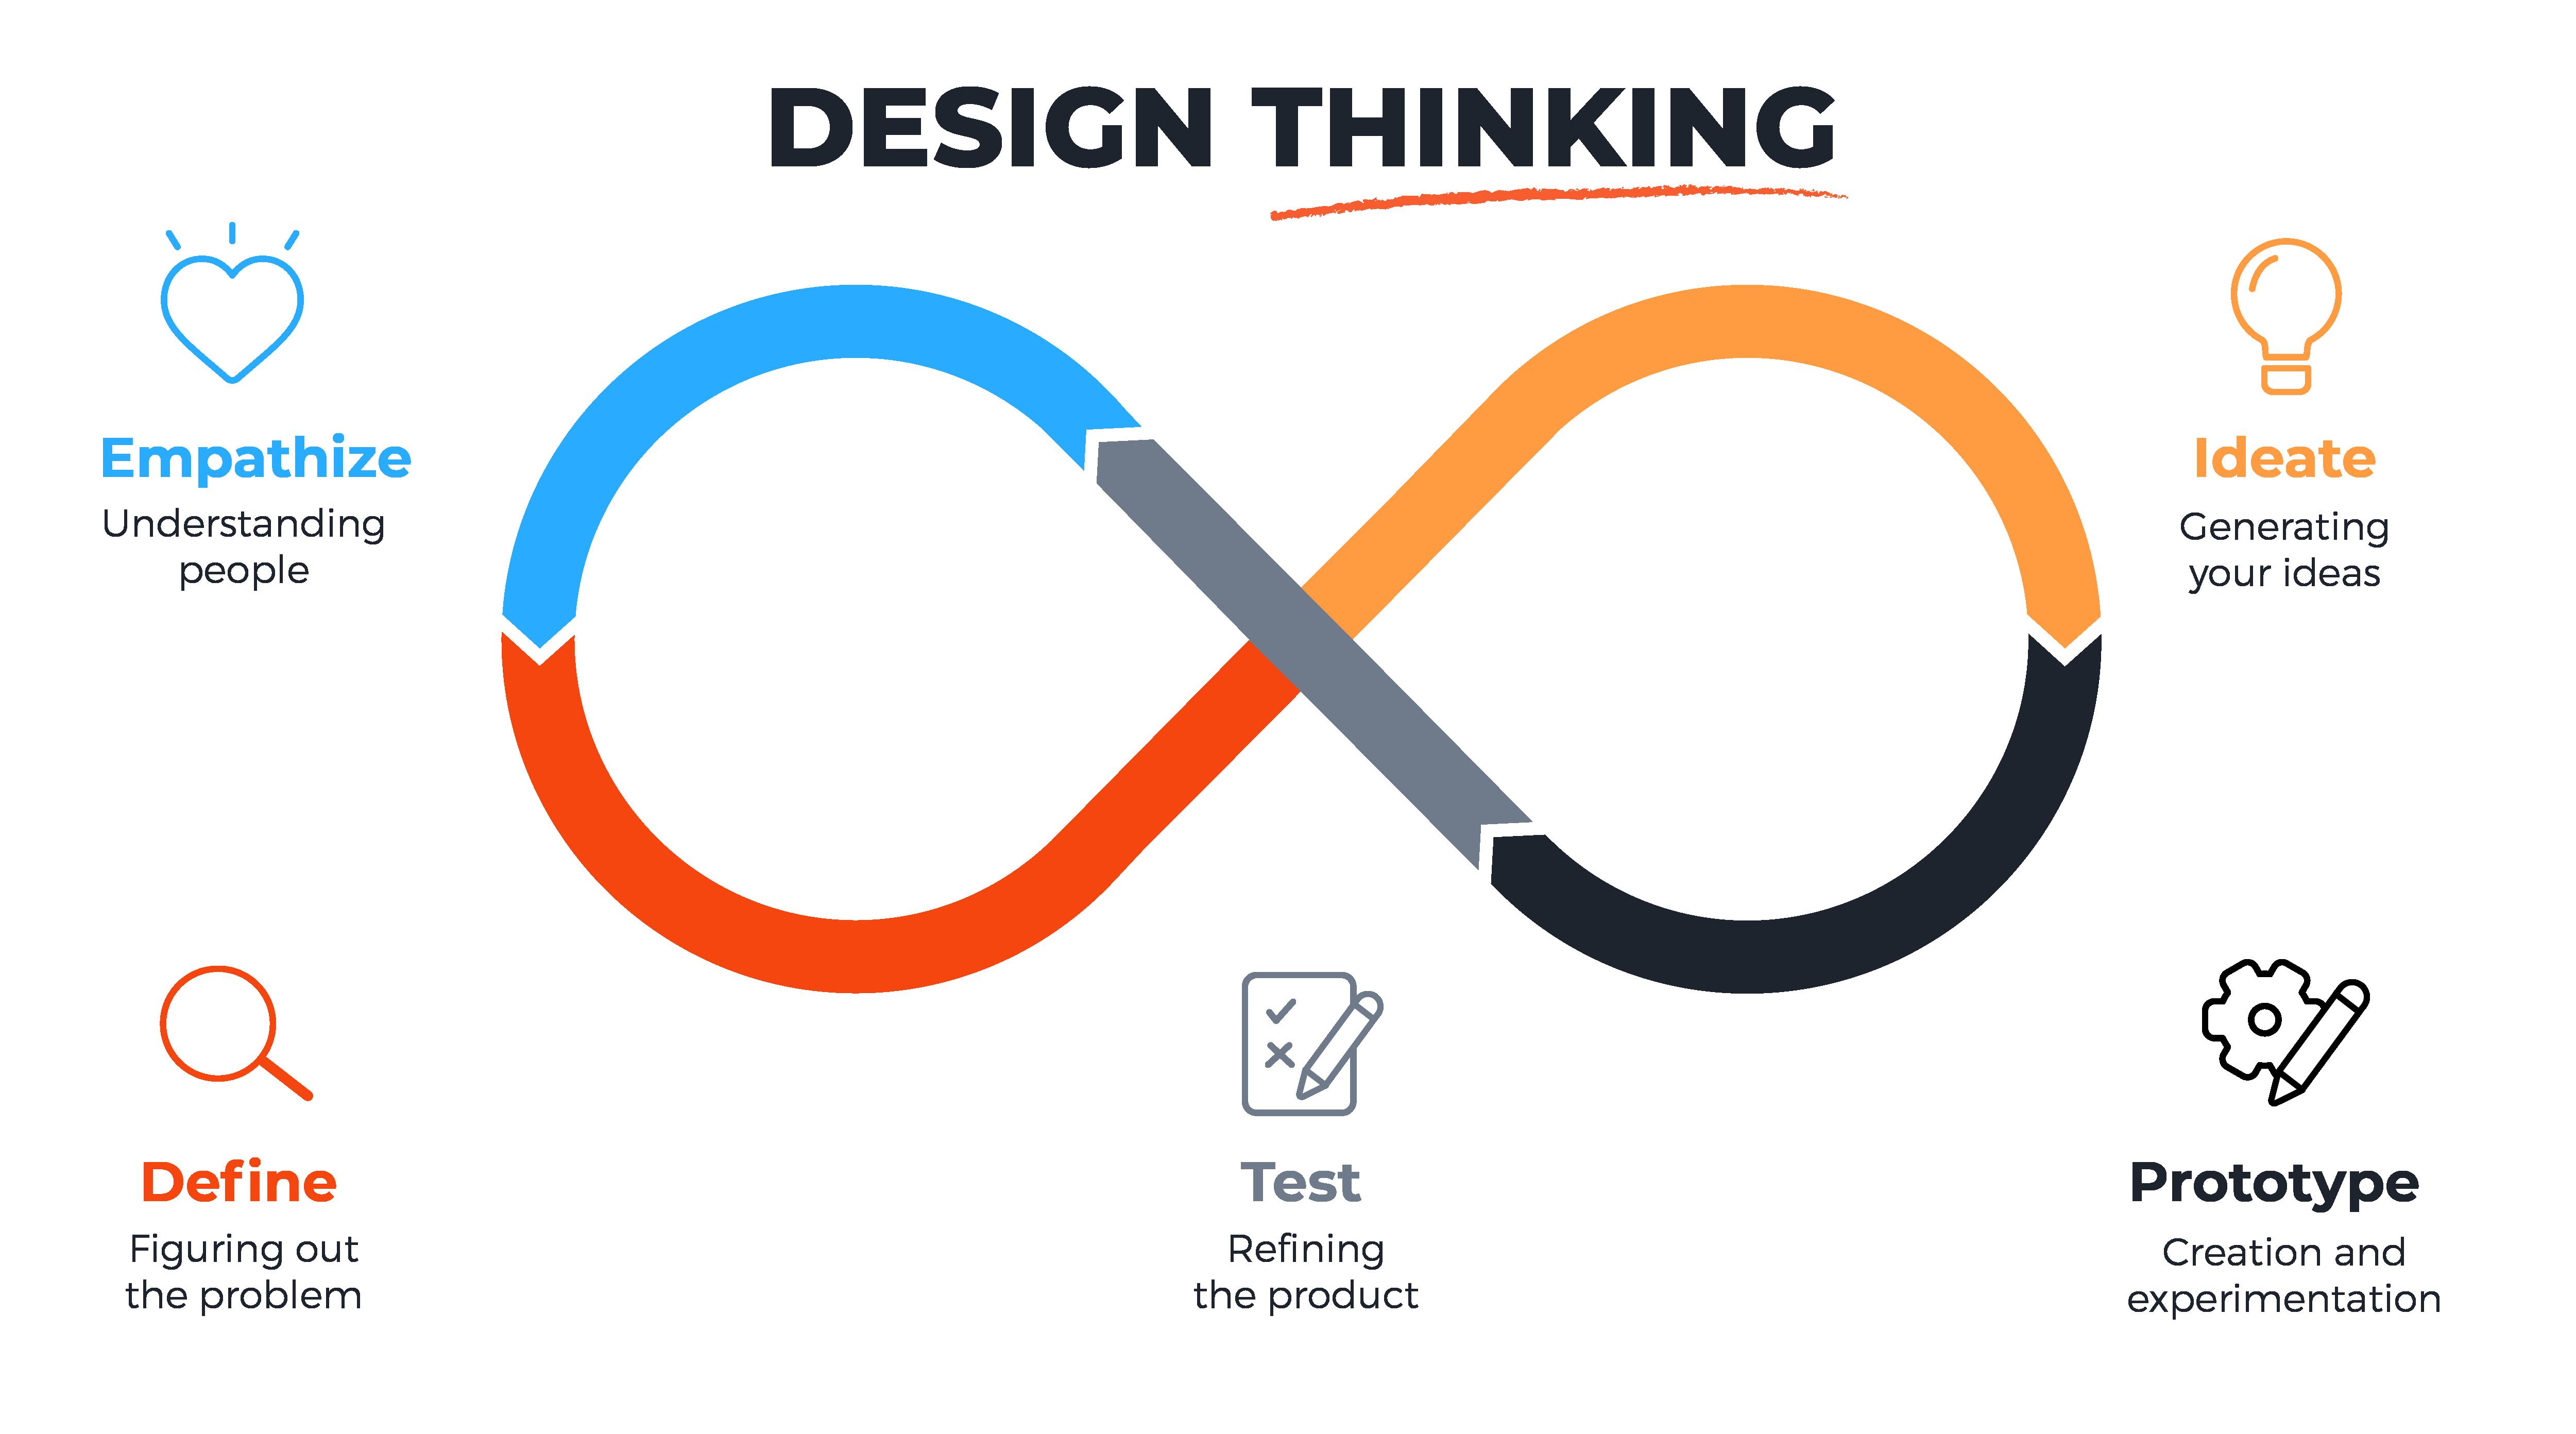 Design thinking: Empathize-Define (the problem)-Ideate (generate ideas)-Prototype-Test